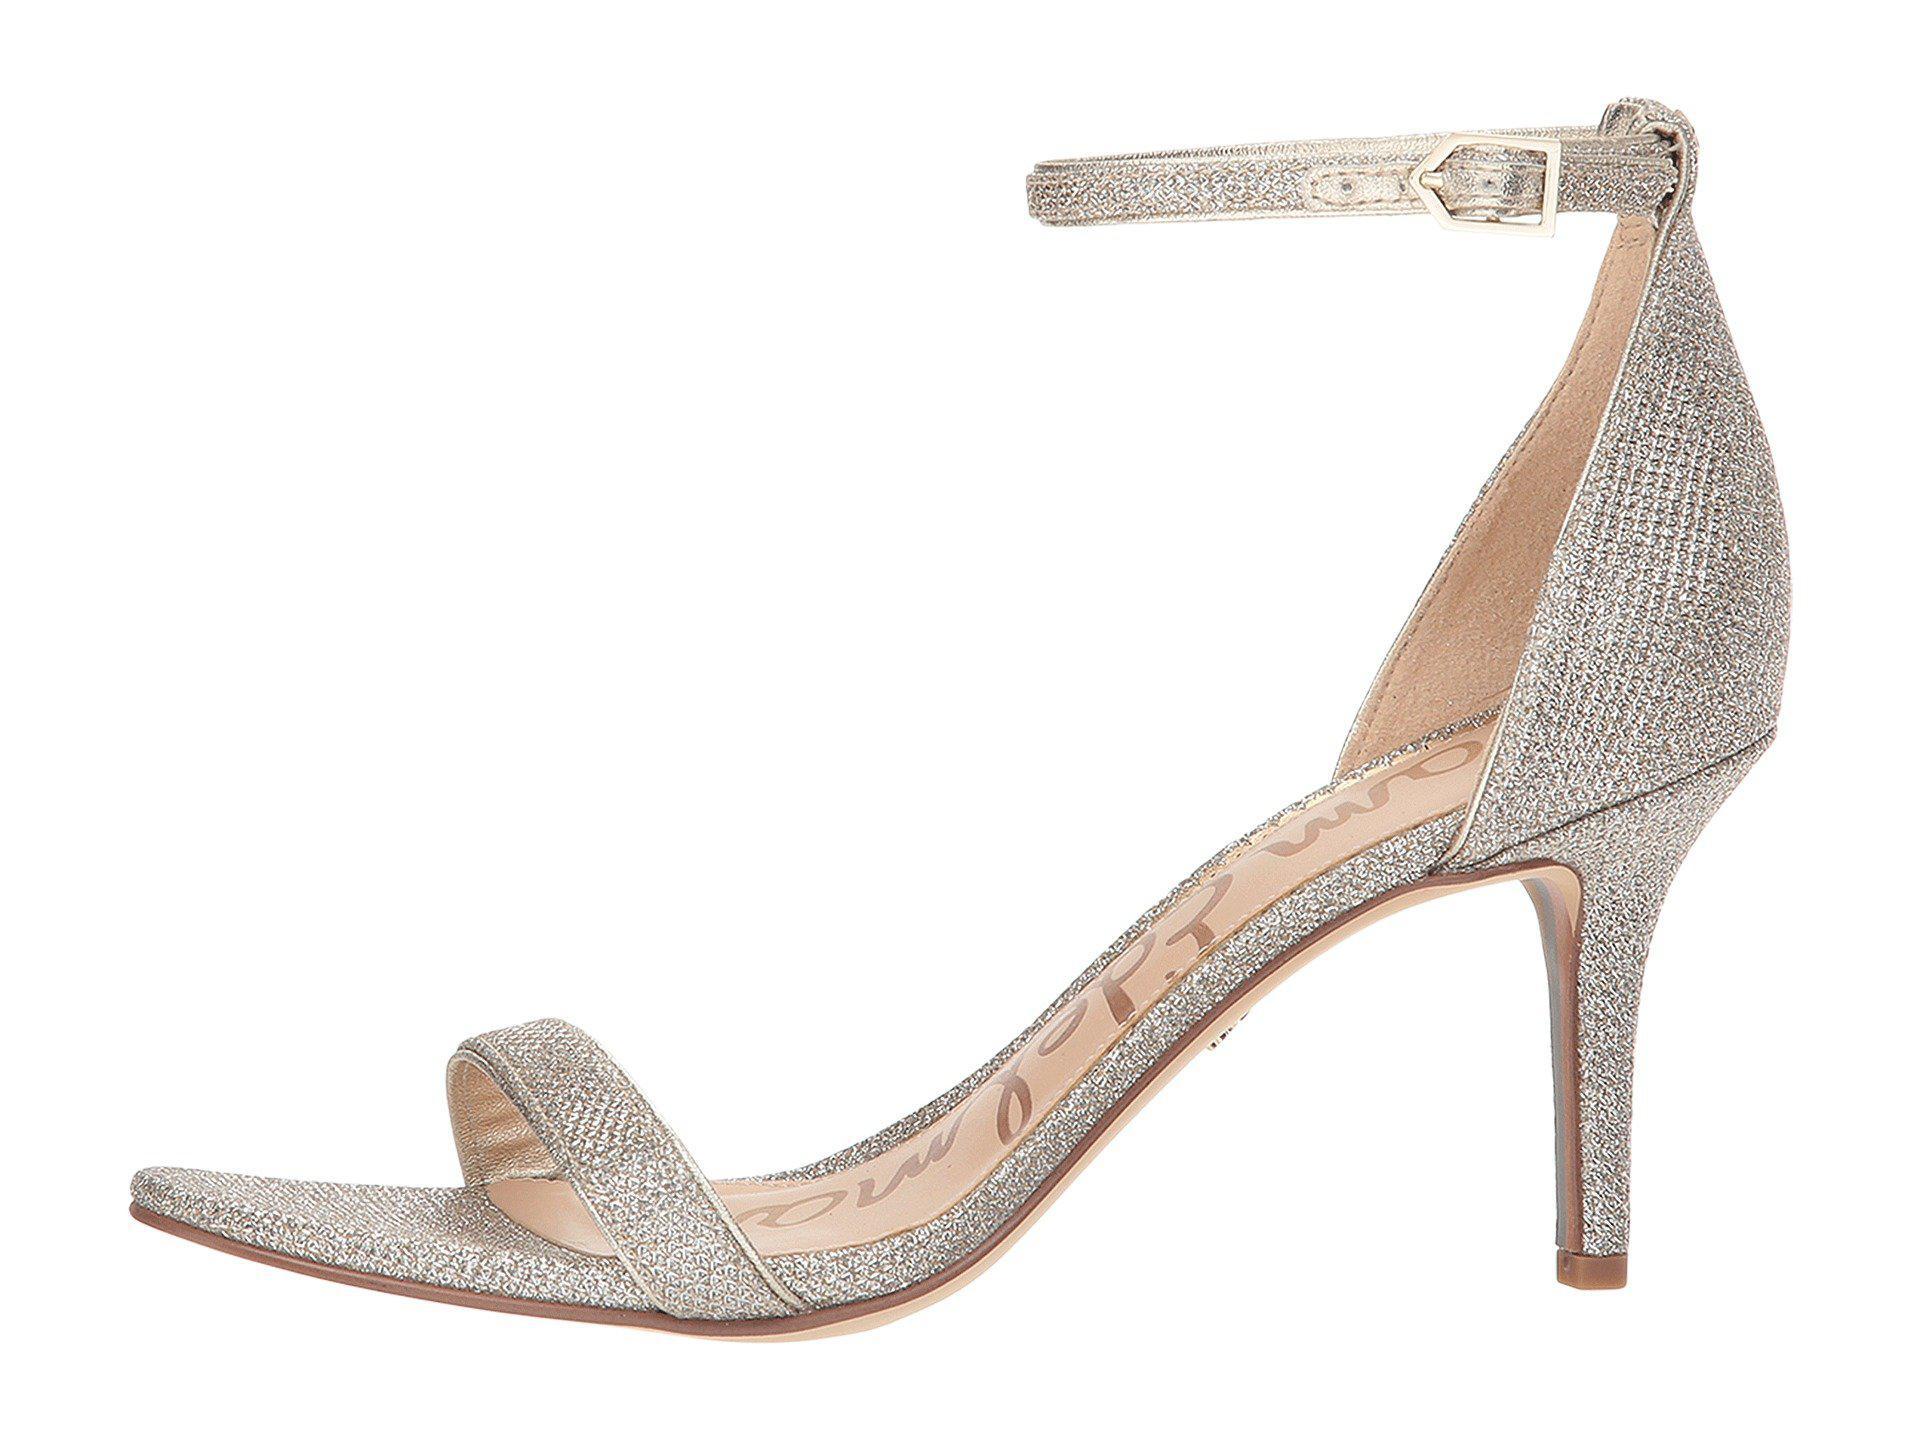 73d393fcc Lyst - Sam Edelman Patti Dress Sandal in Metallic - Save 41%